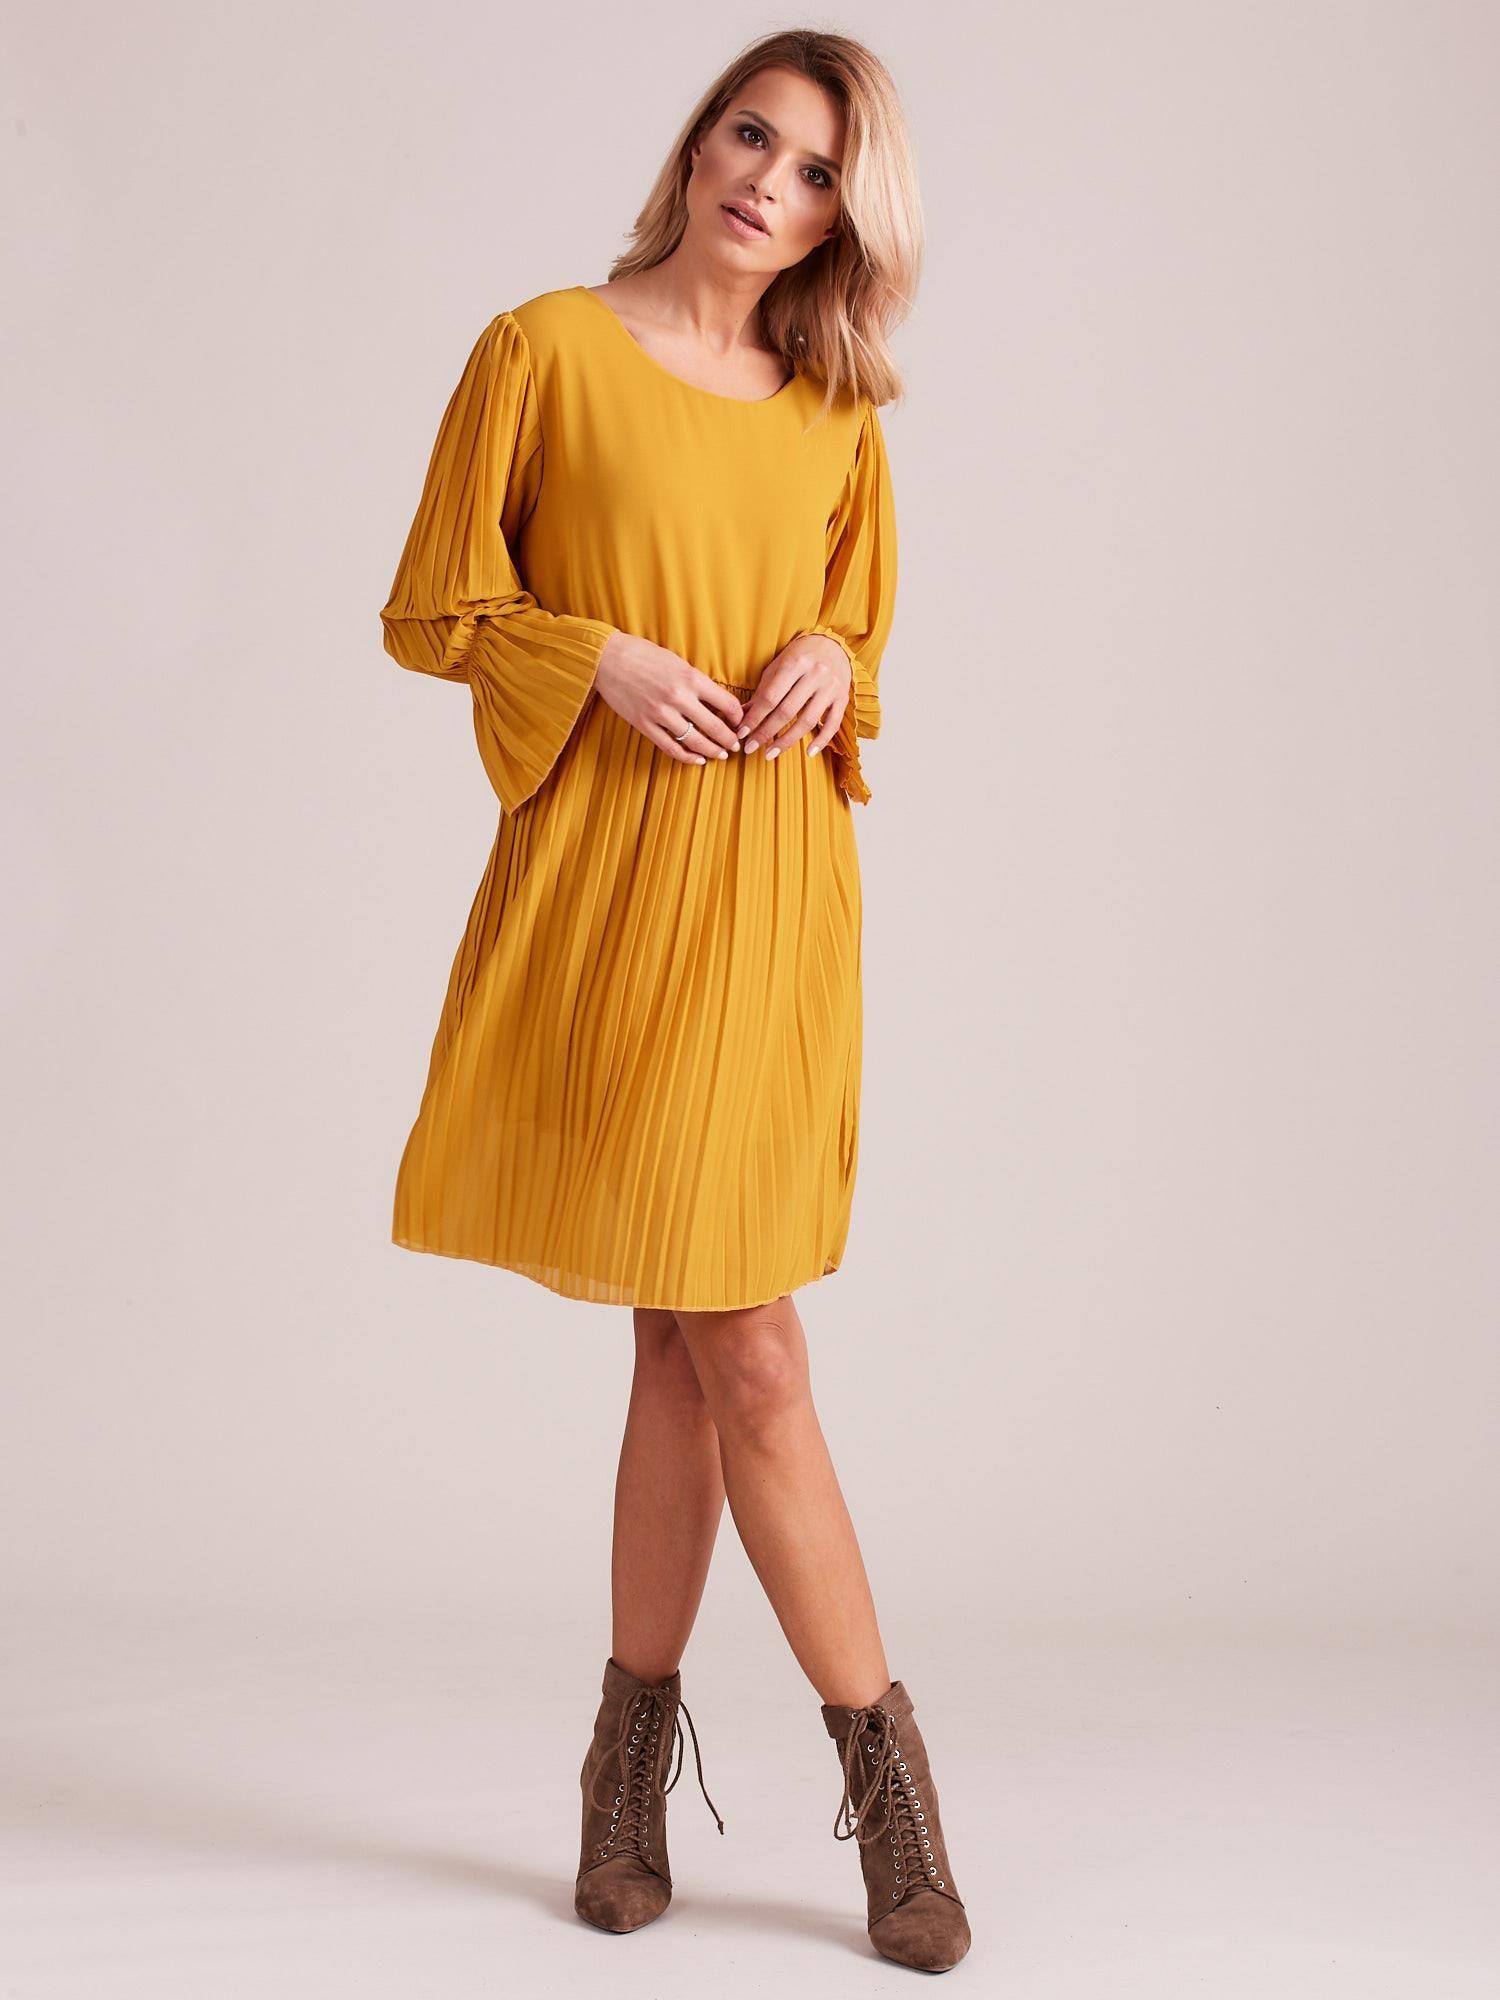 9c351b80 Musztardowa plisowana sukienka